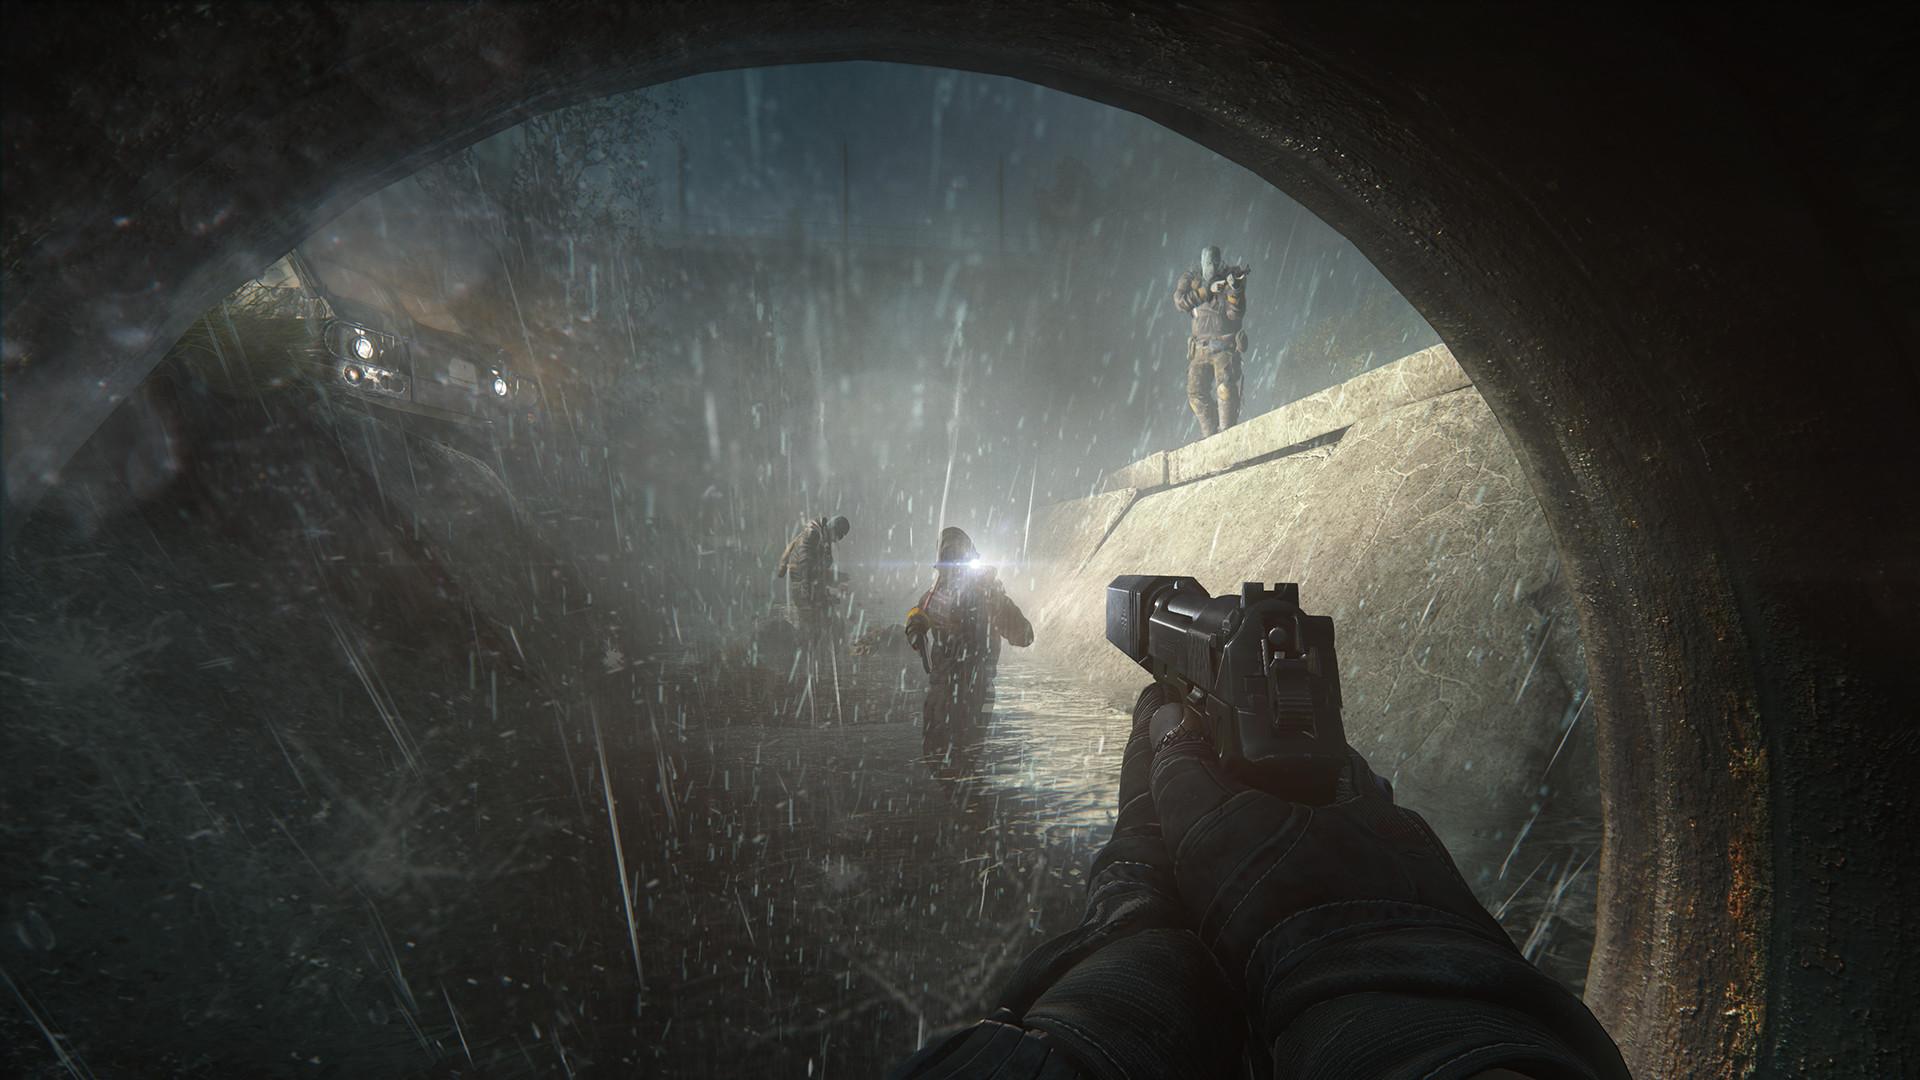 download sniper ghost warrior 3 season pass edition-baldman latest update singlelink iso cracked by baldman full version multi 10 language free for pc